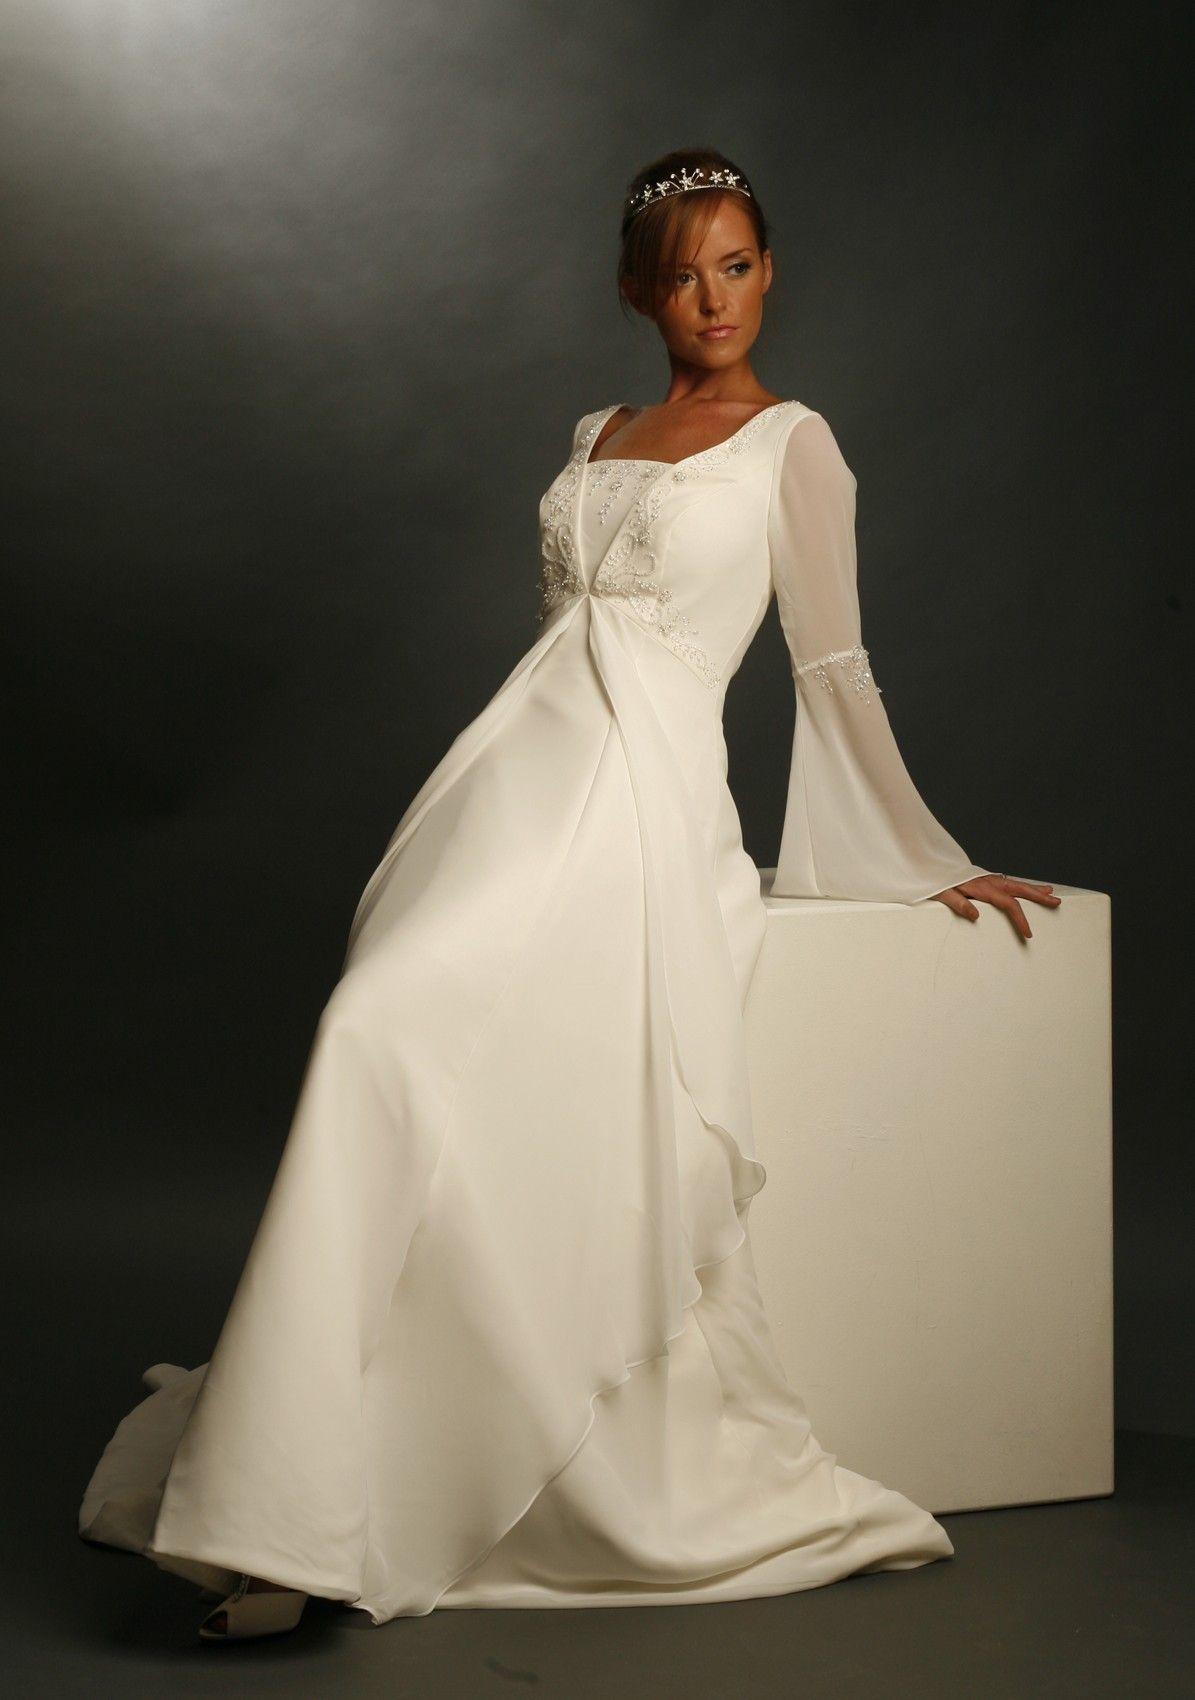 wedding dress celtic style All Priddi dresses are